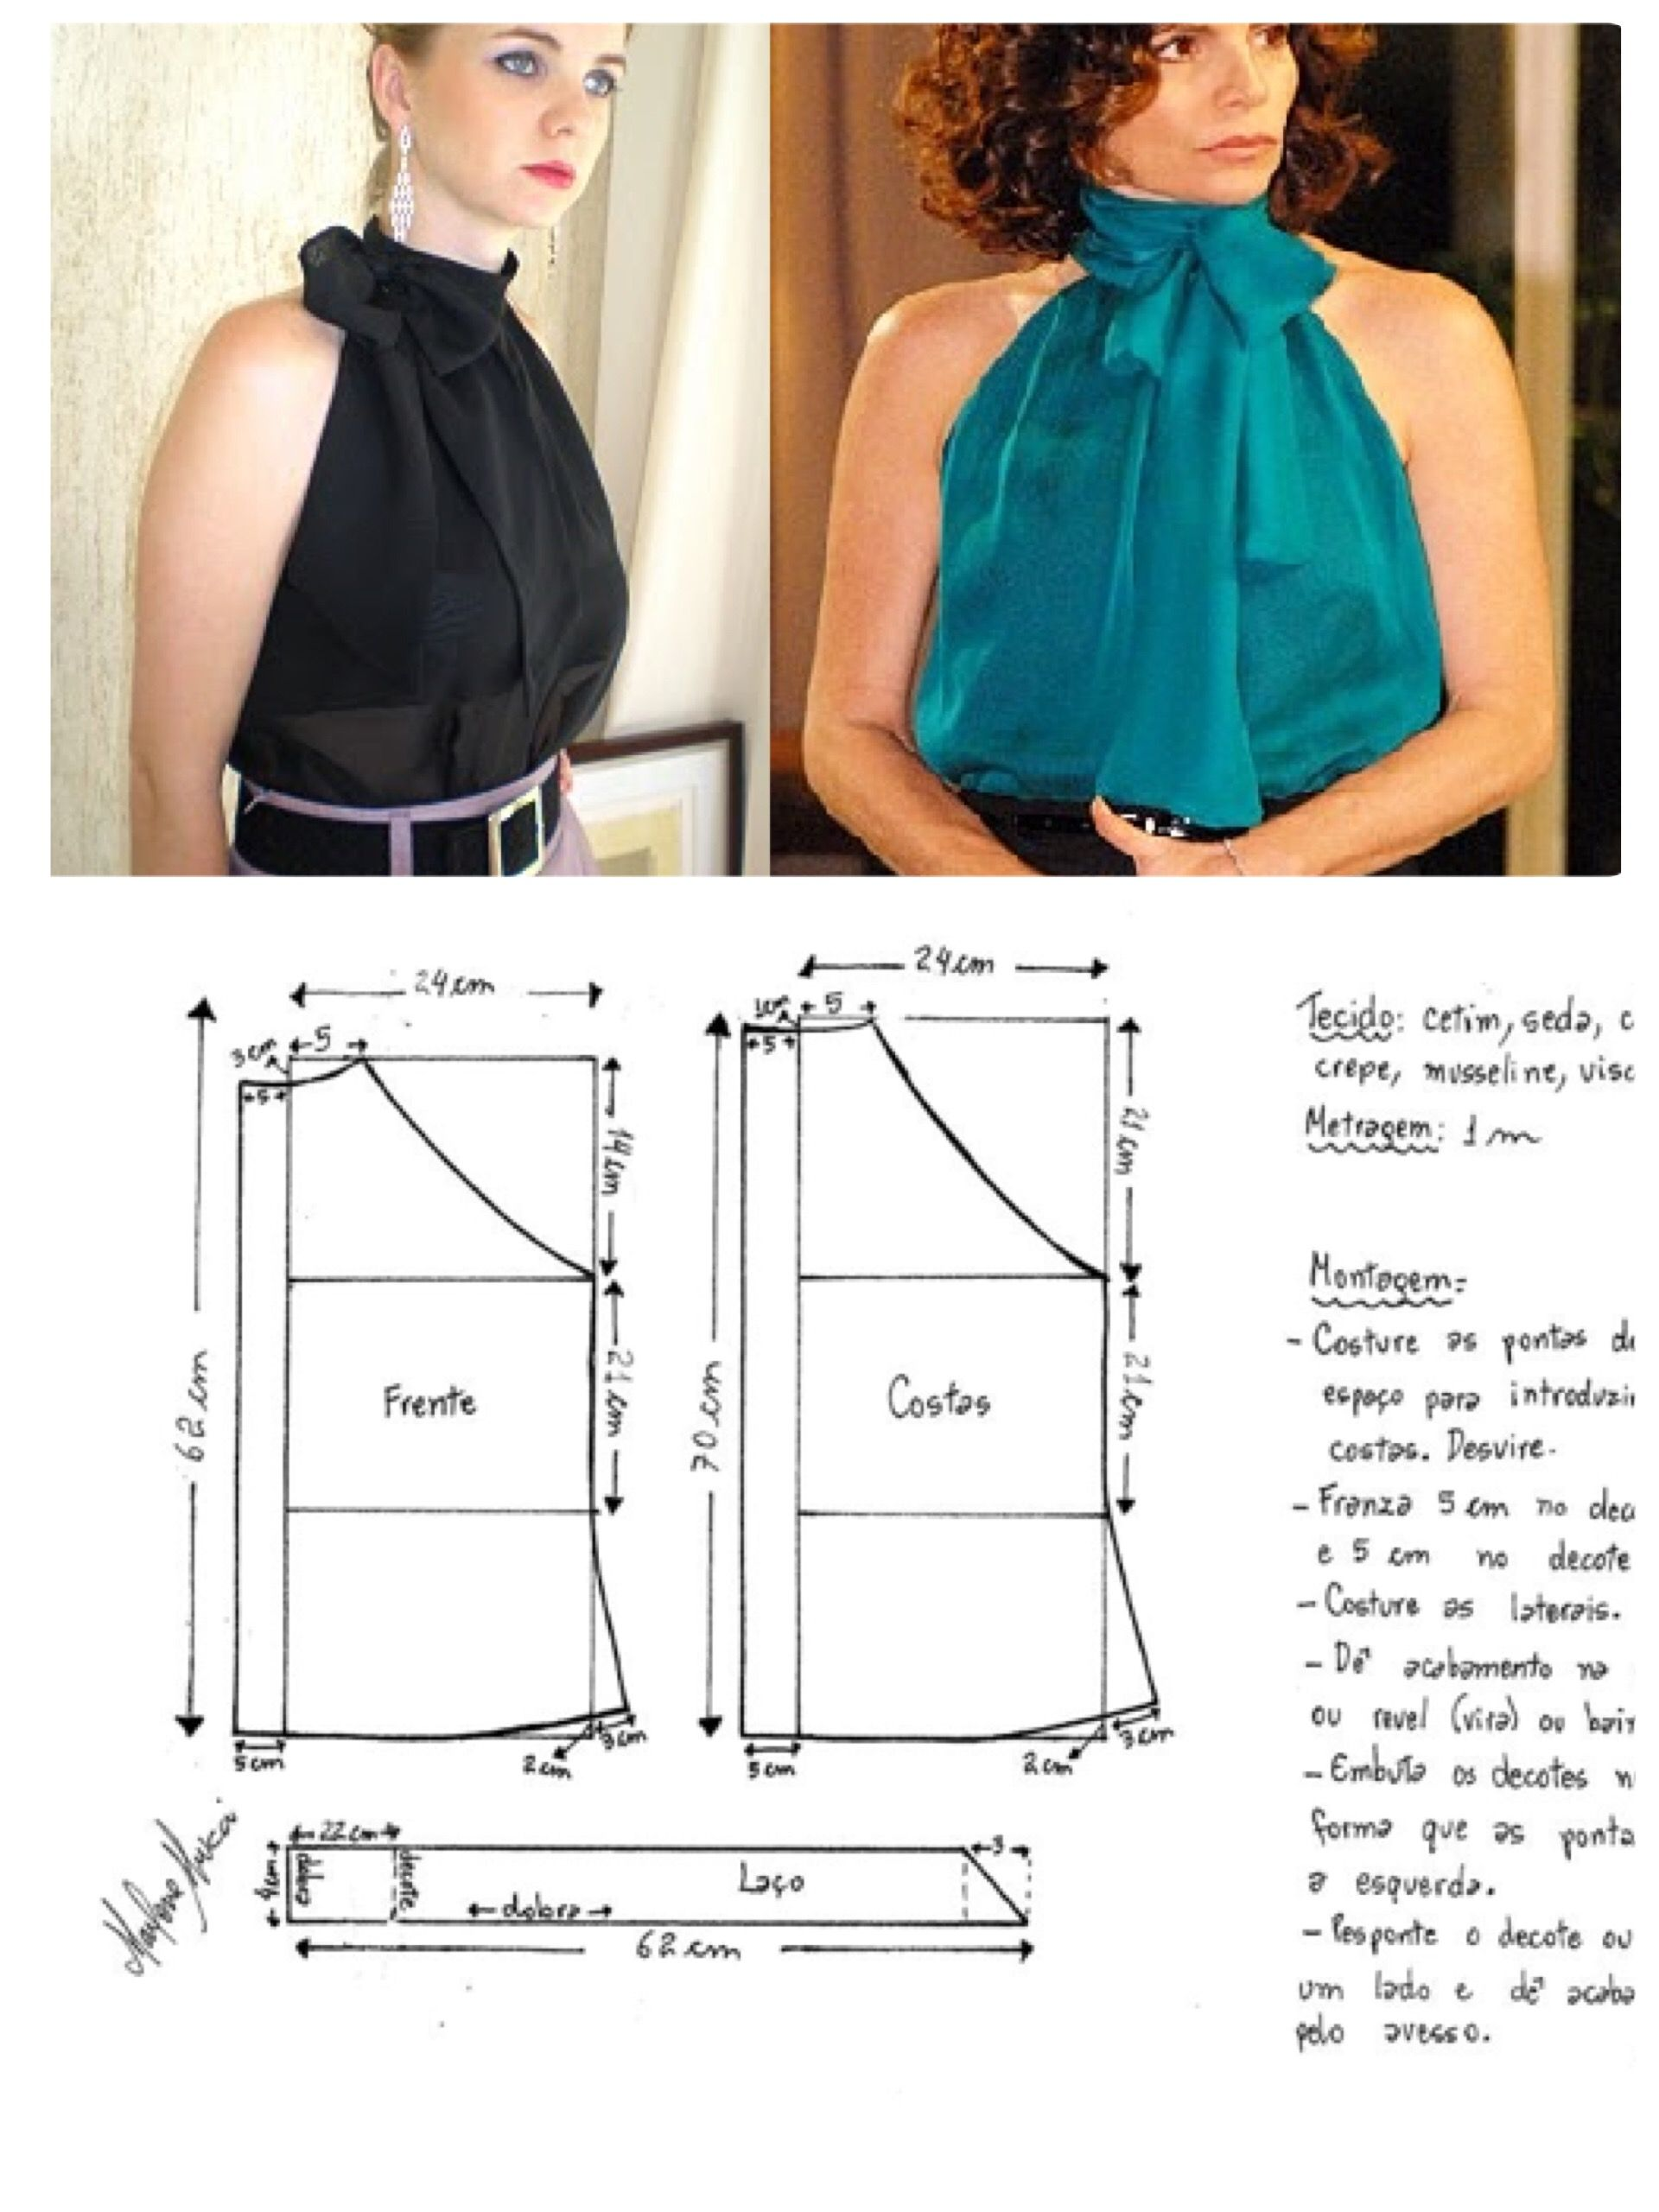 Pin de Marlys Vasquez en de coser... uyyyyy | Pinterest | Costura ...